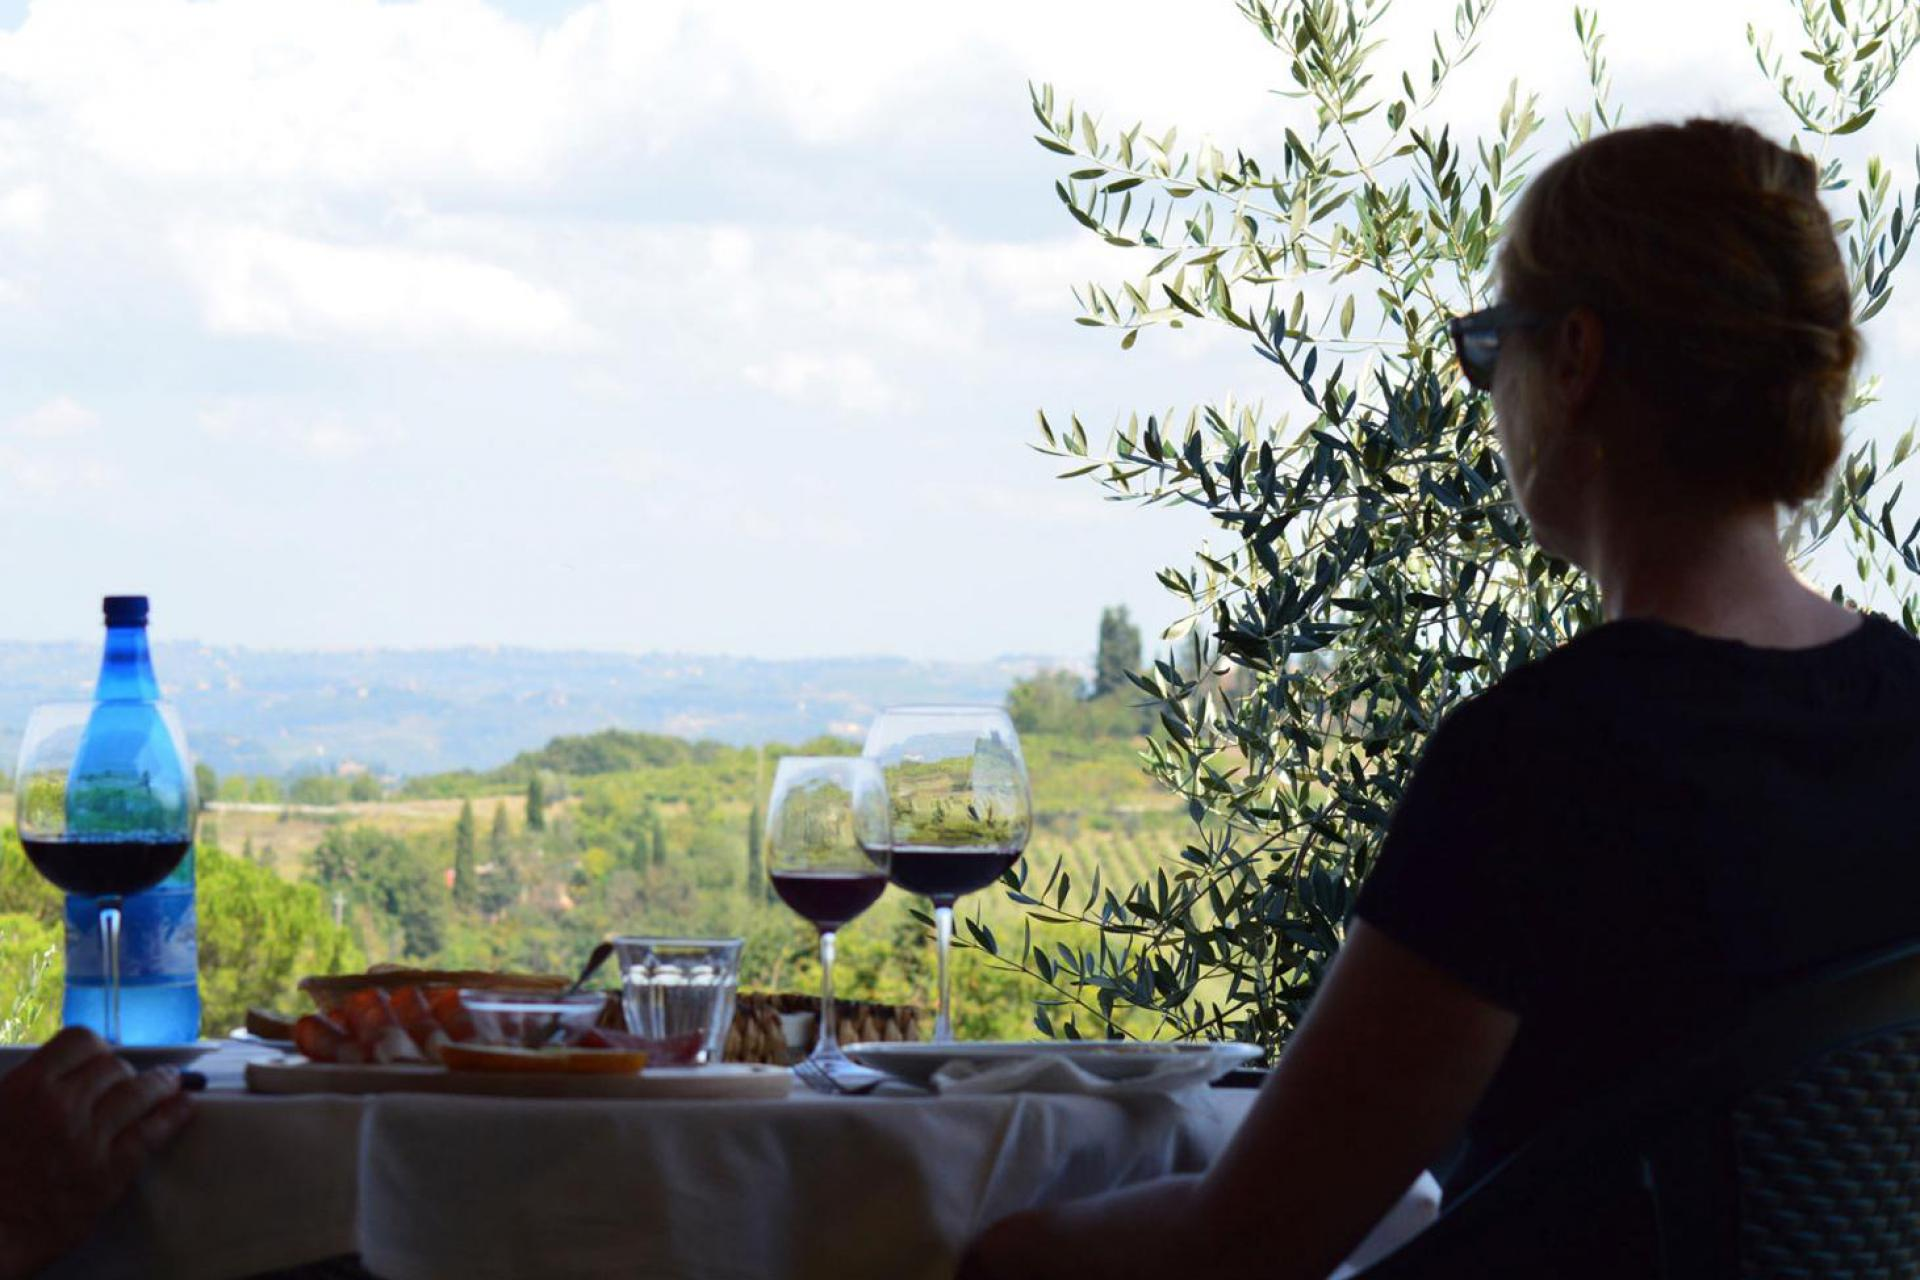 Klein wijnhuis bij San Gimignano